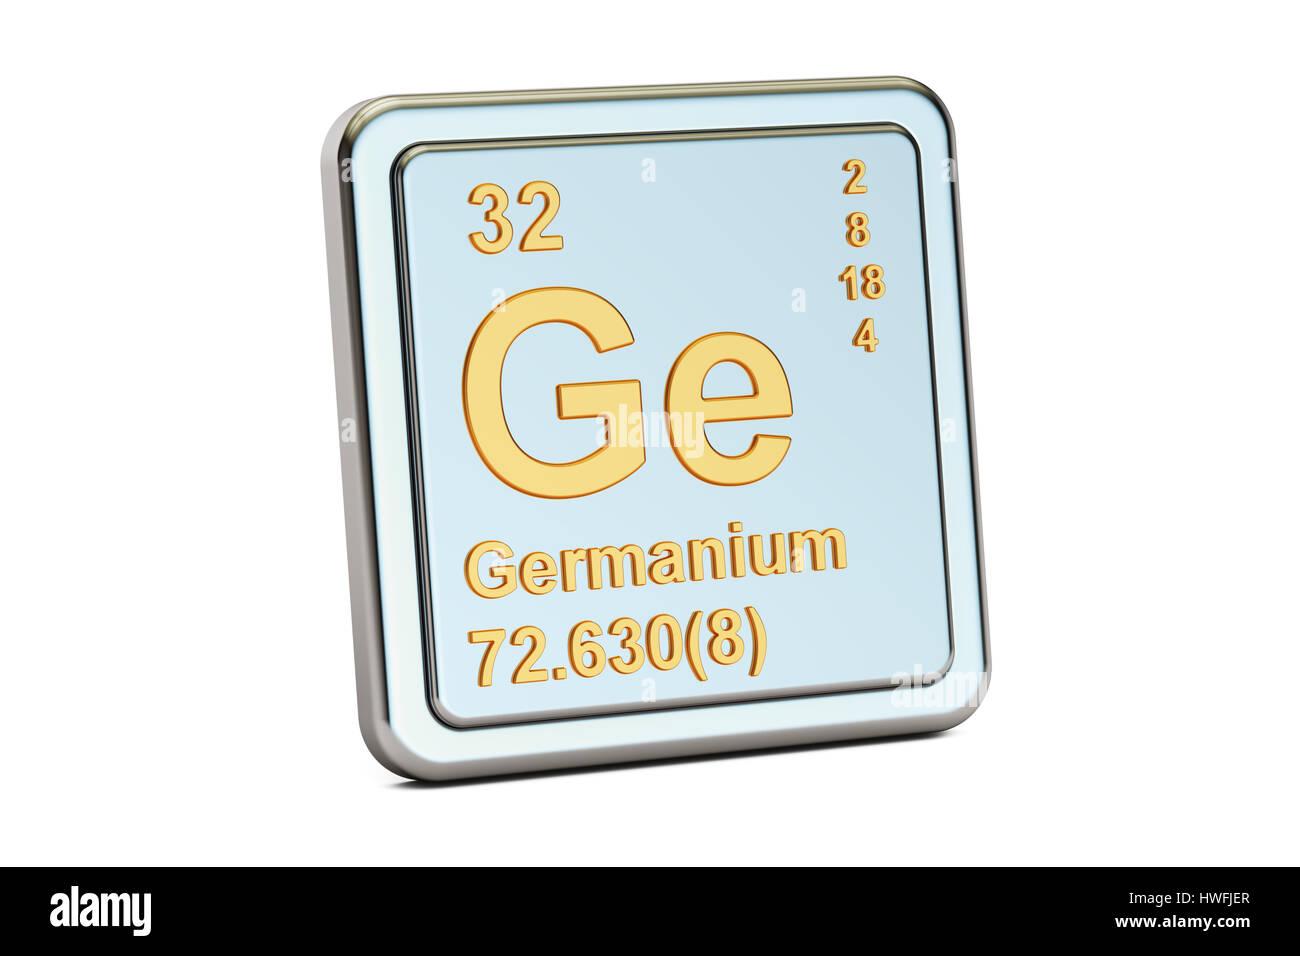 Germanium Ge Stock Photos Germanium Ge Stock Images Alamy